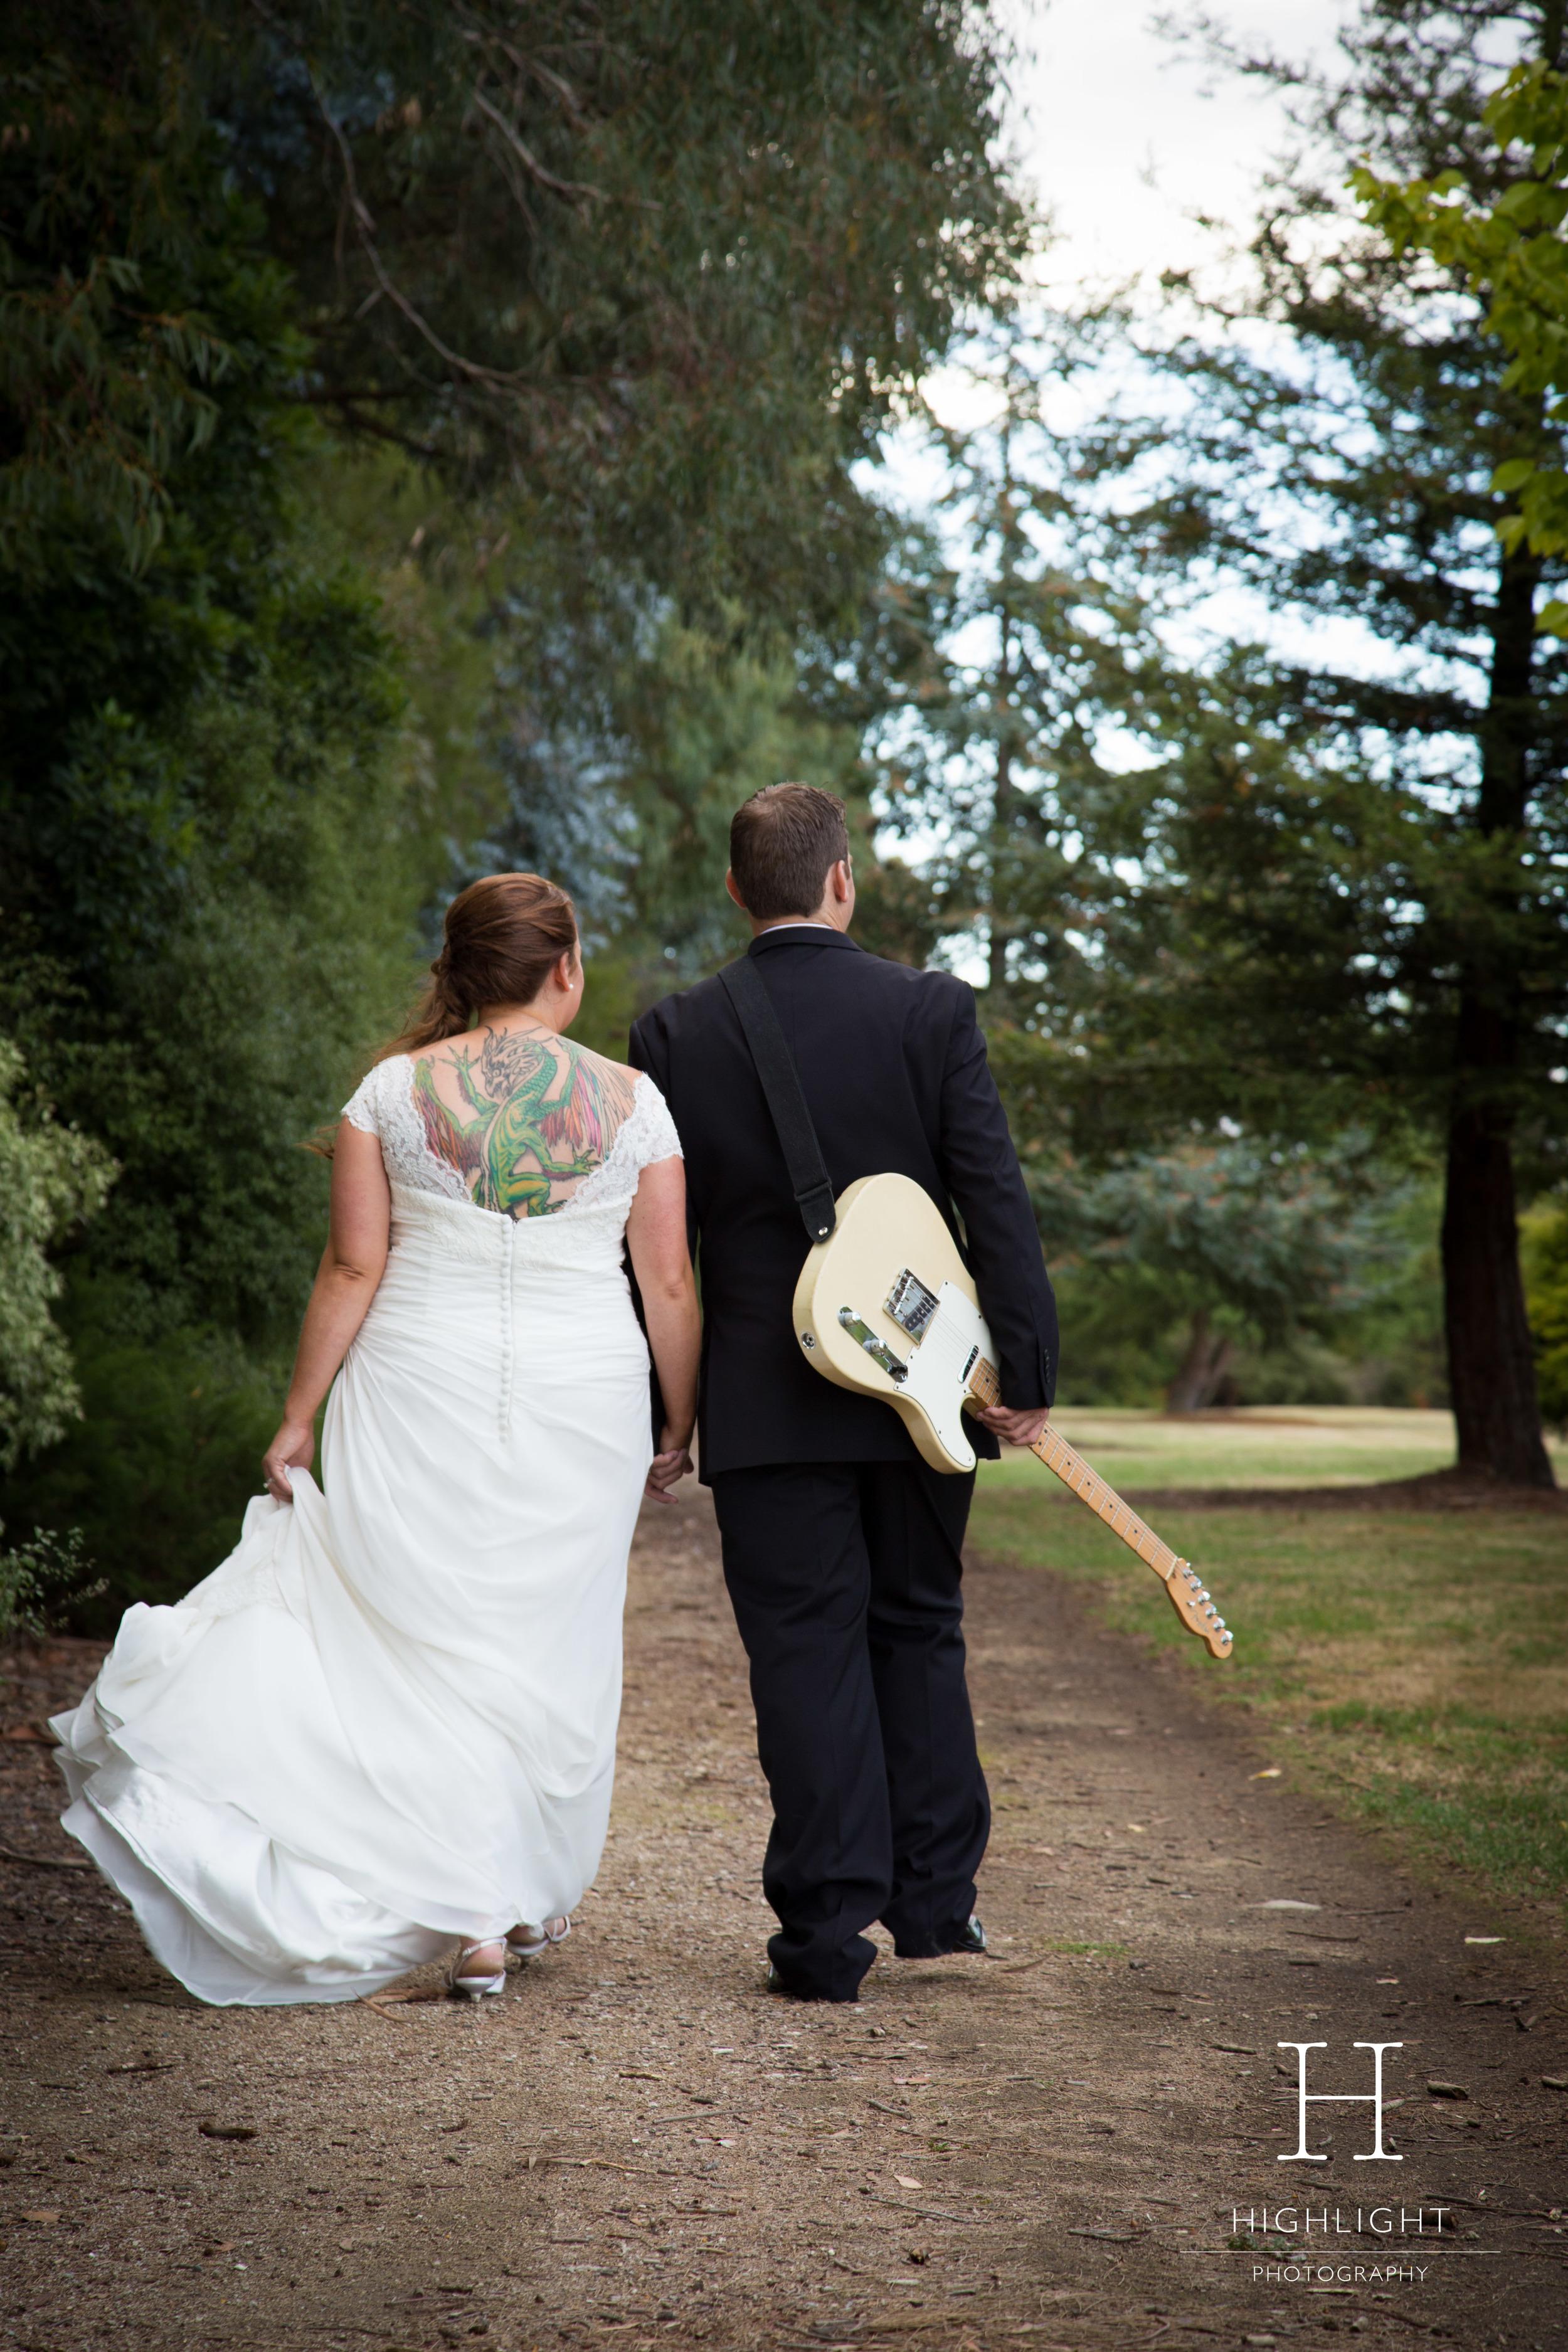 highlight_photography_wedding_masterton_guitar.jpg